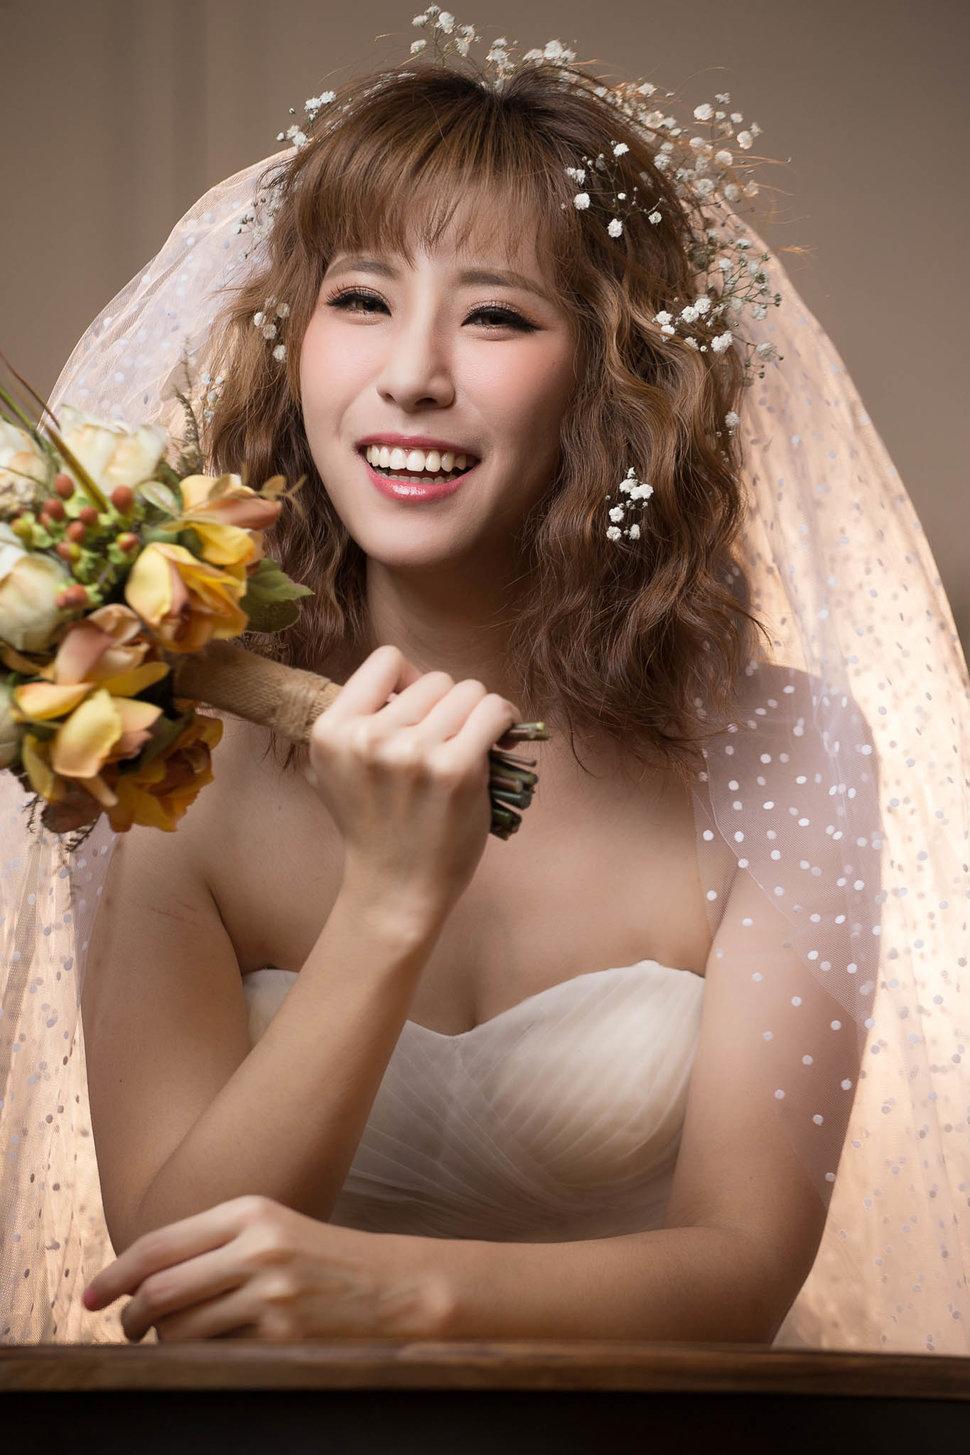 18PHOTO自主婚紗-潤兒(編號:406257) - 18PHOTO 婚紗影像攝影工作室 - 結婚吧